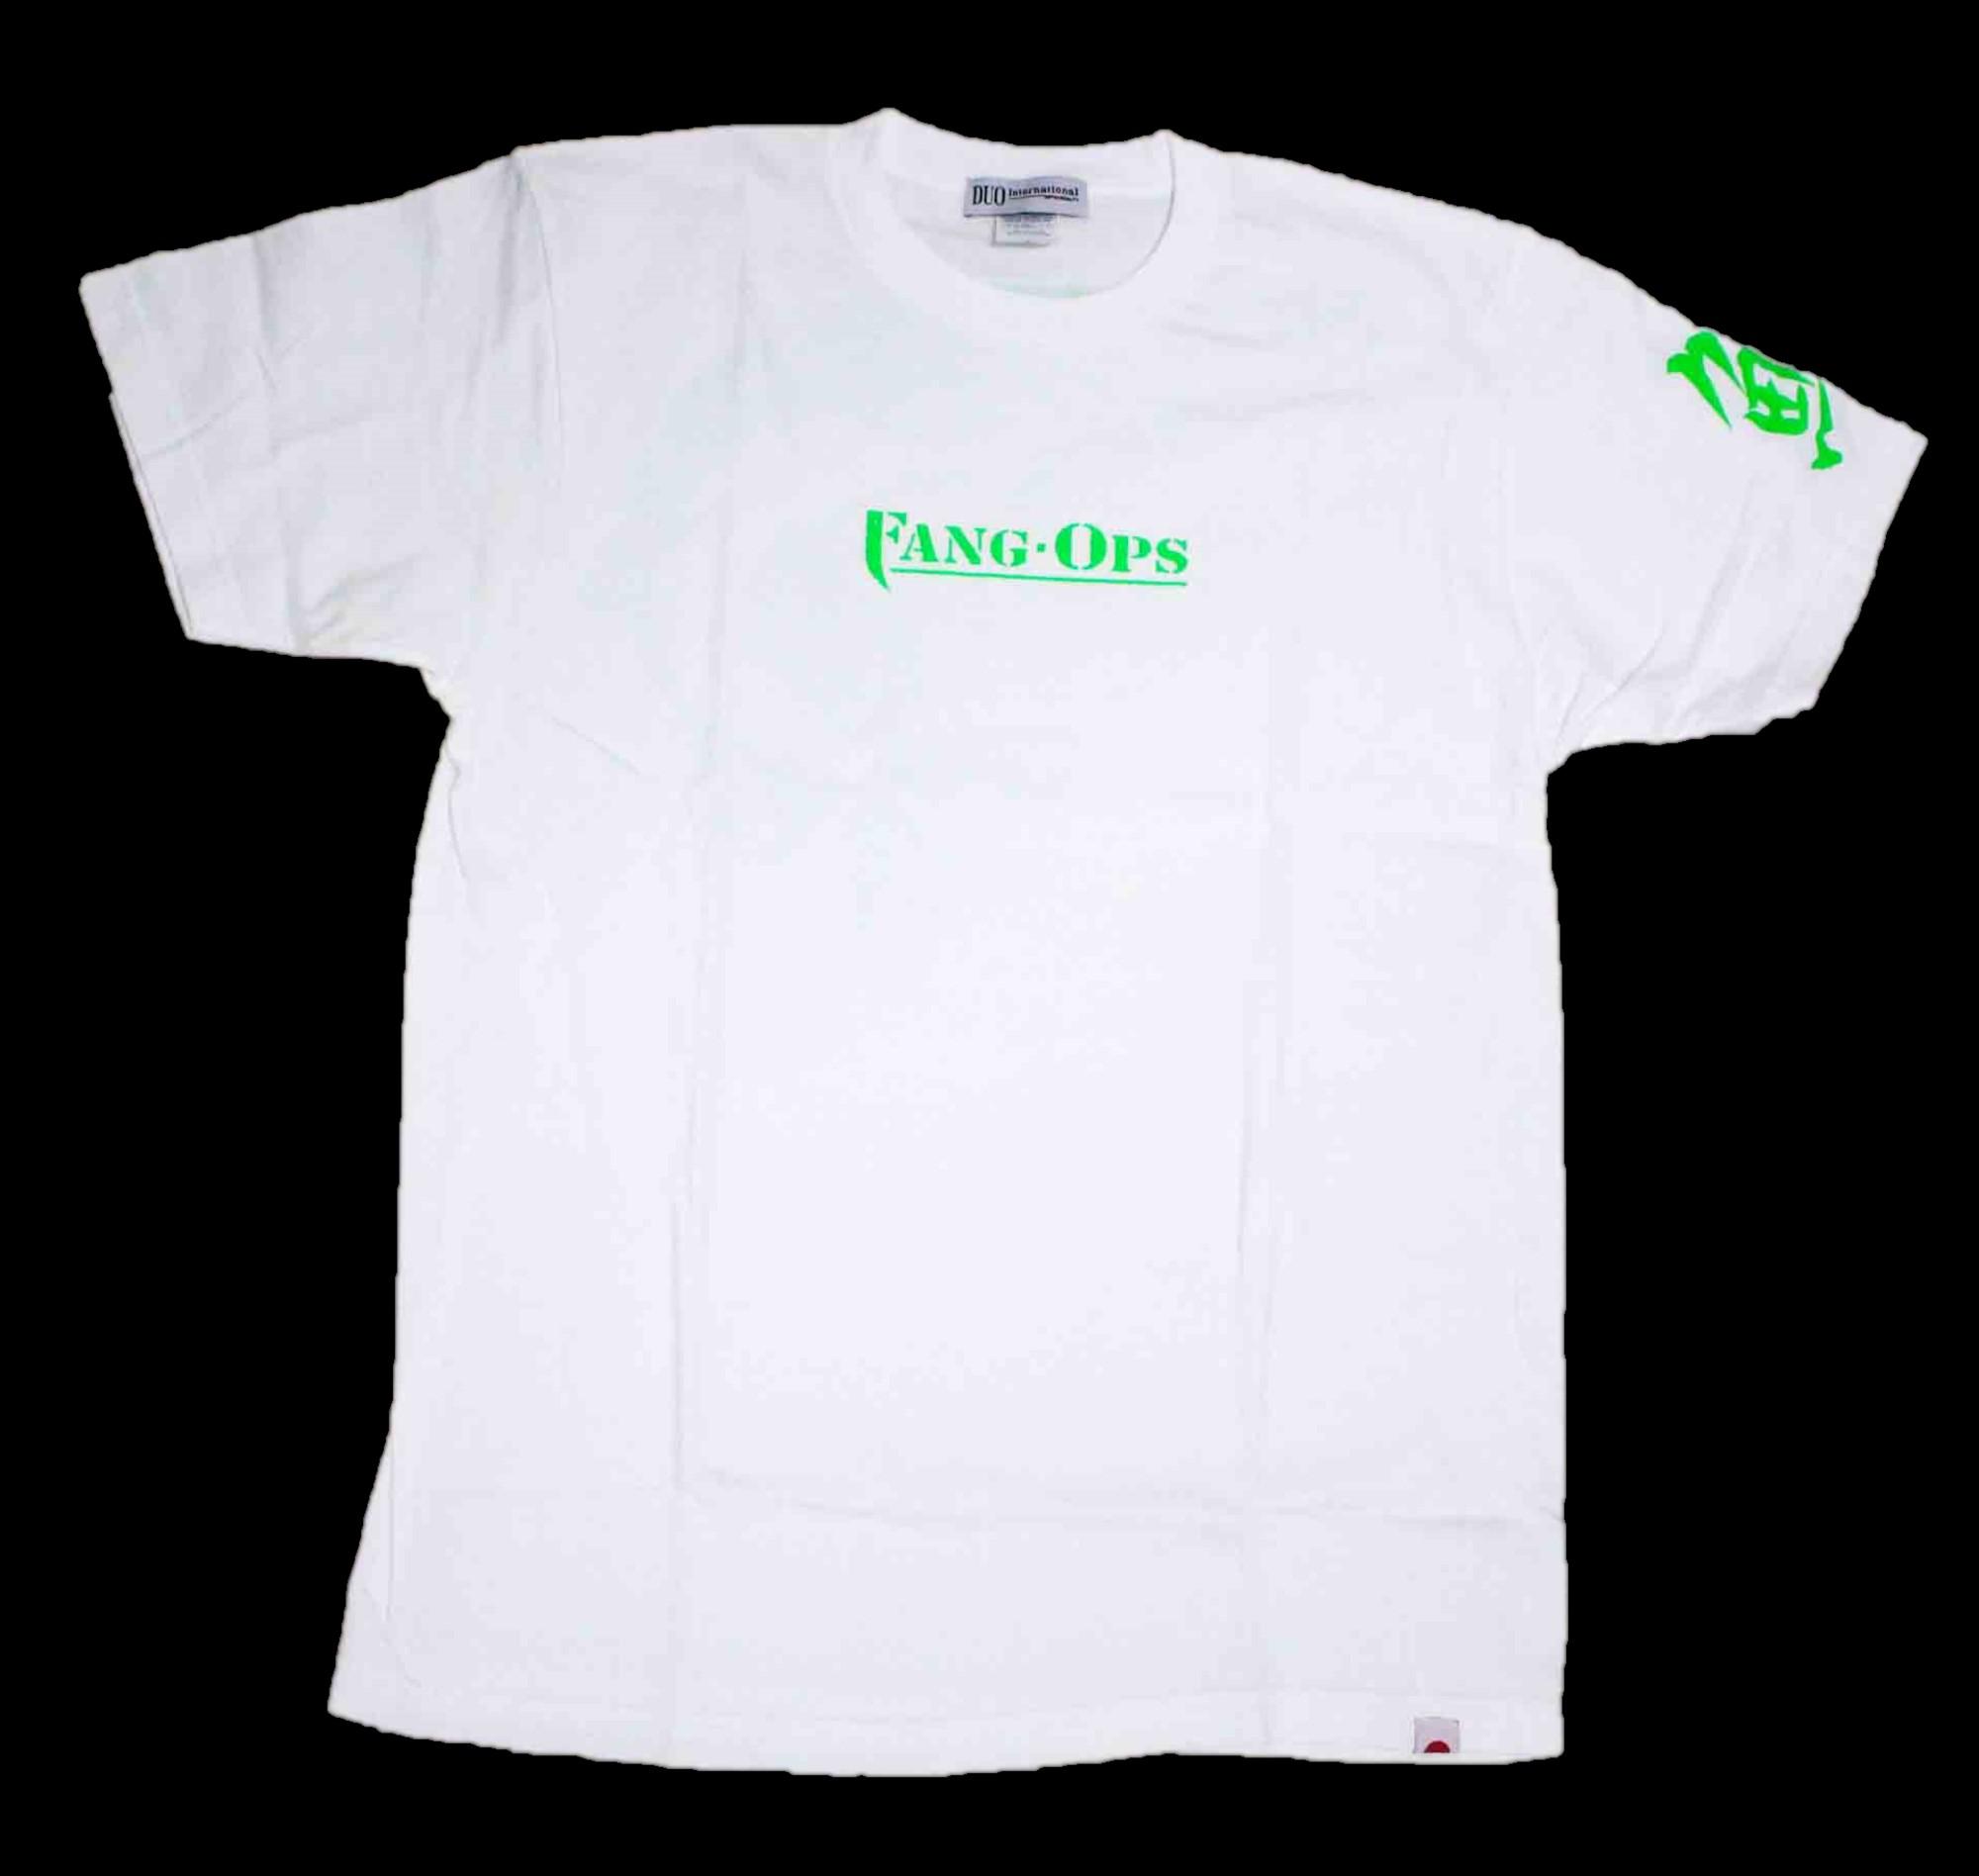 Duo T Shirt Fang Ops Beast Pike Short Sleeve Cotton White Size XXL (1553)